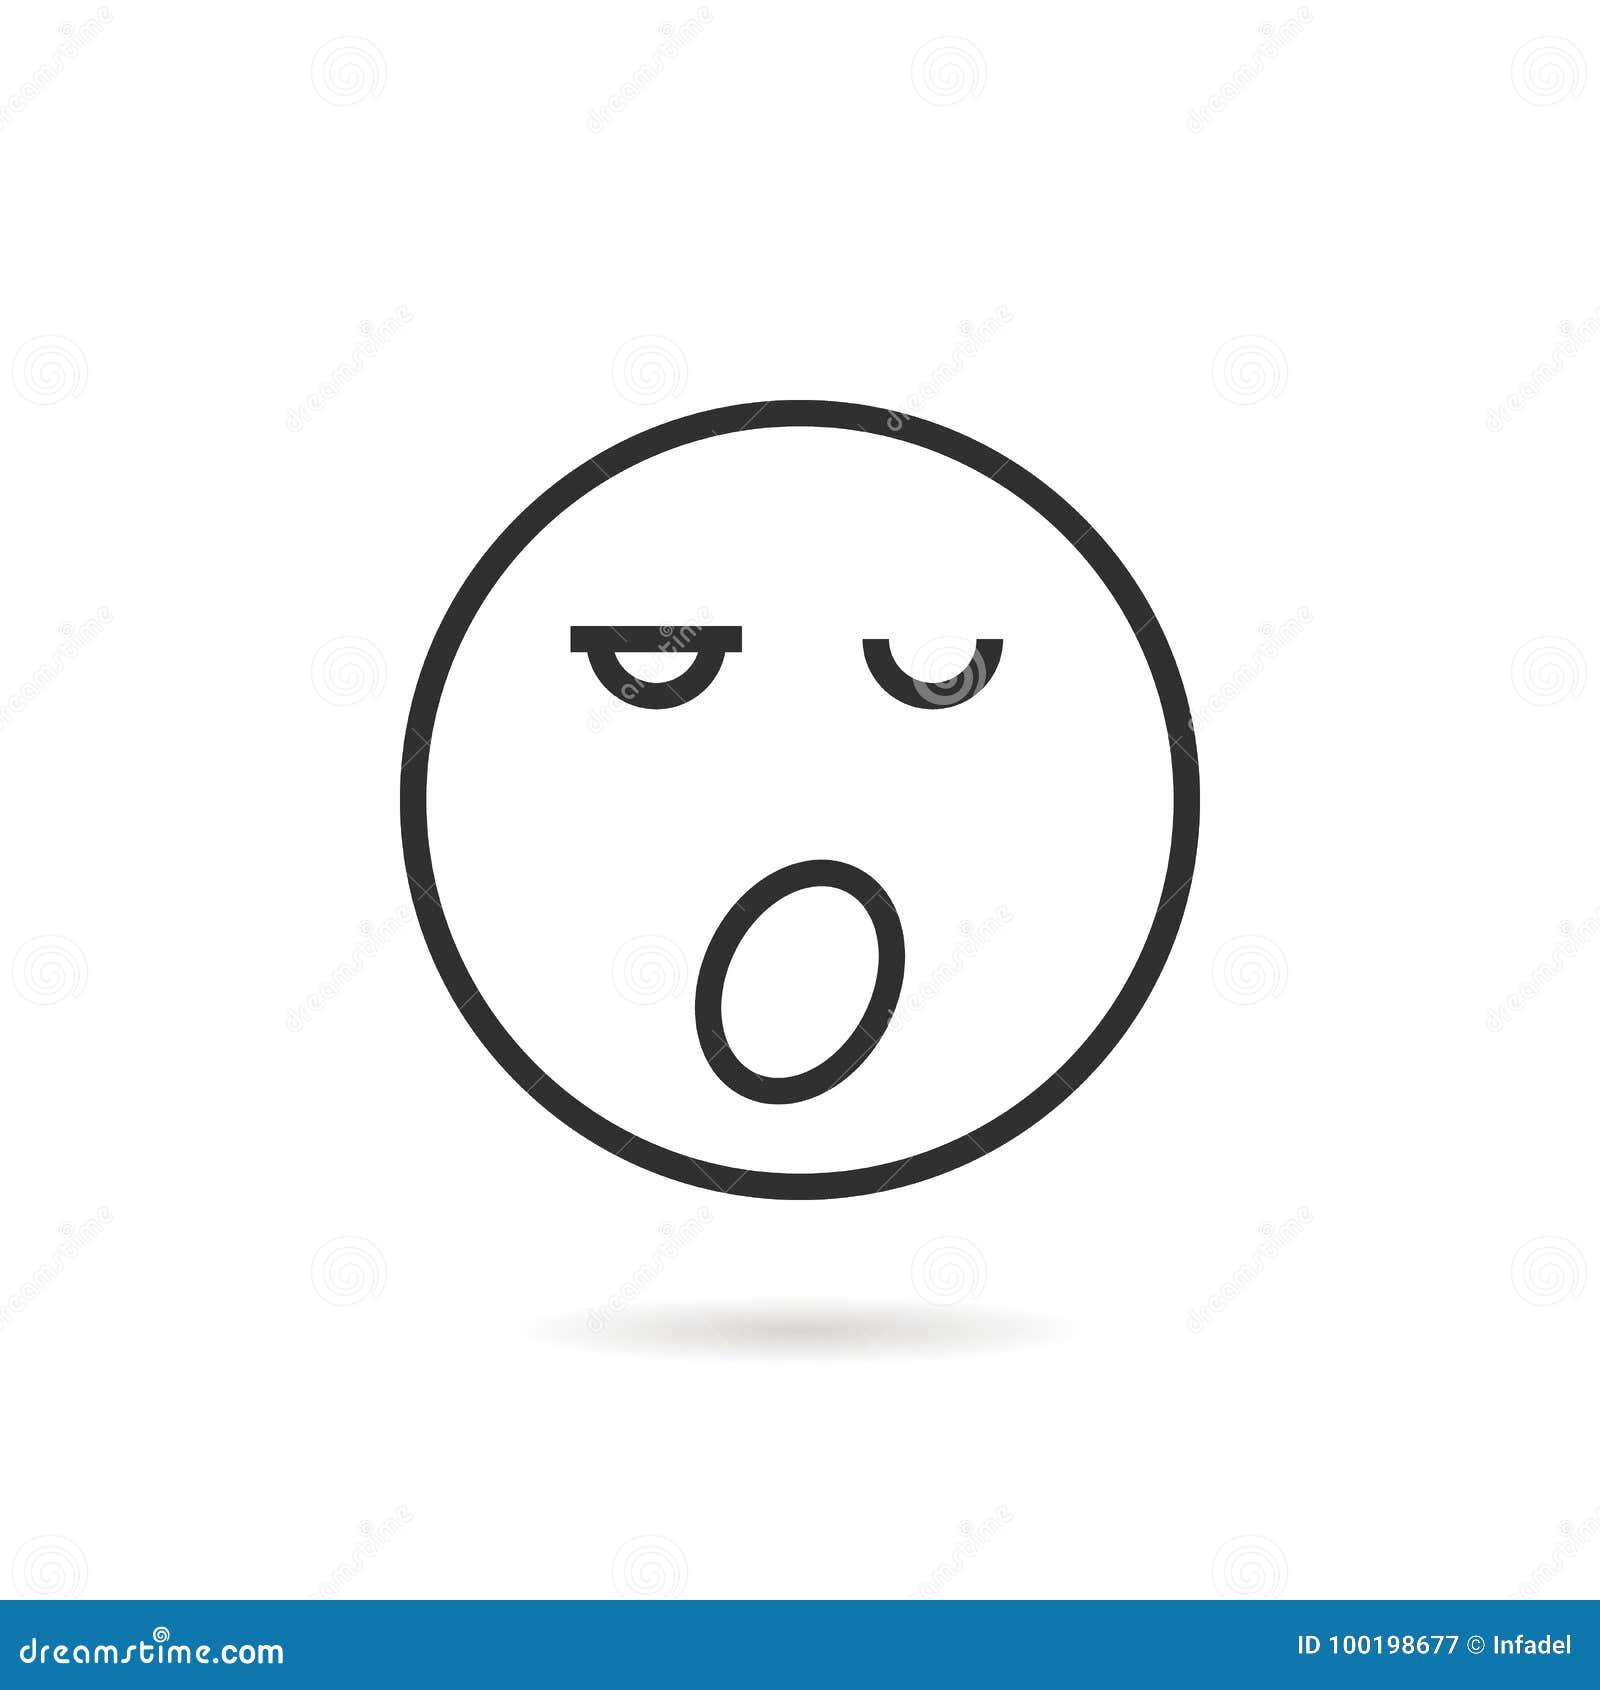 Sleepy Thin Line Emoji Icon With Shadow Stock Vector - Illustration